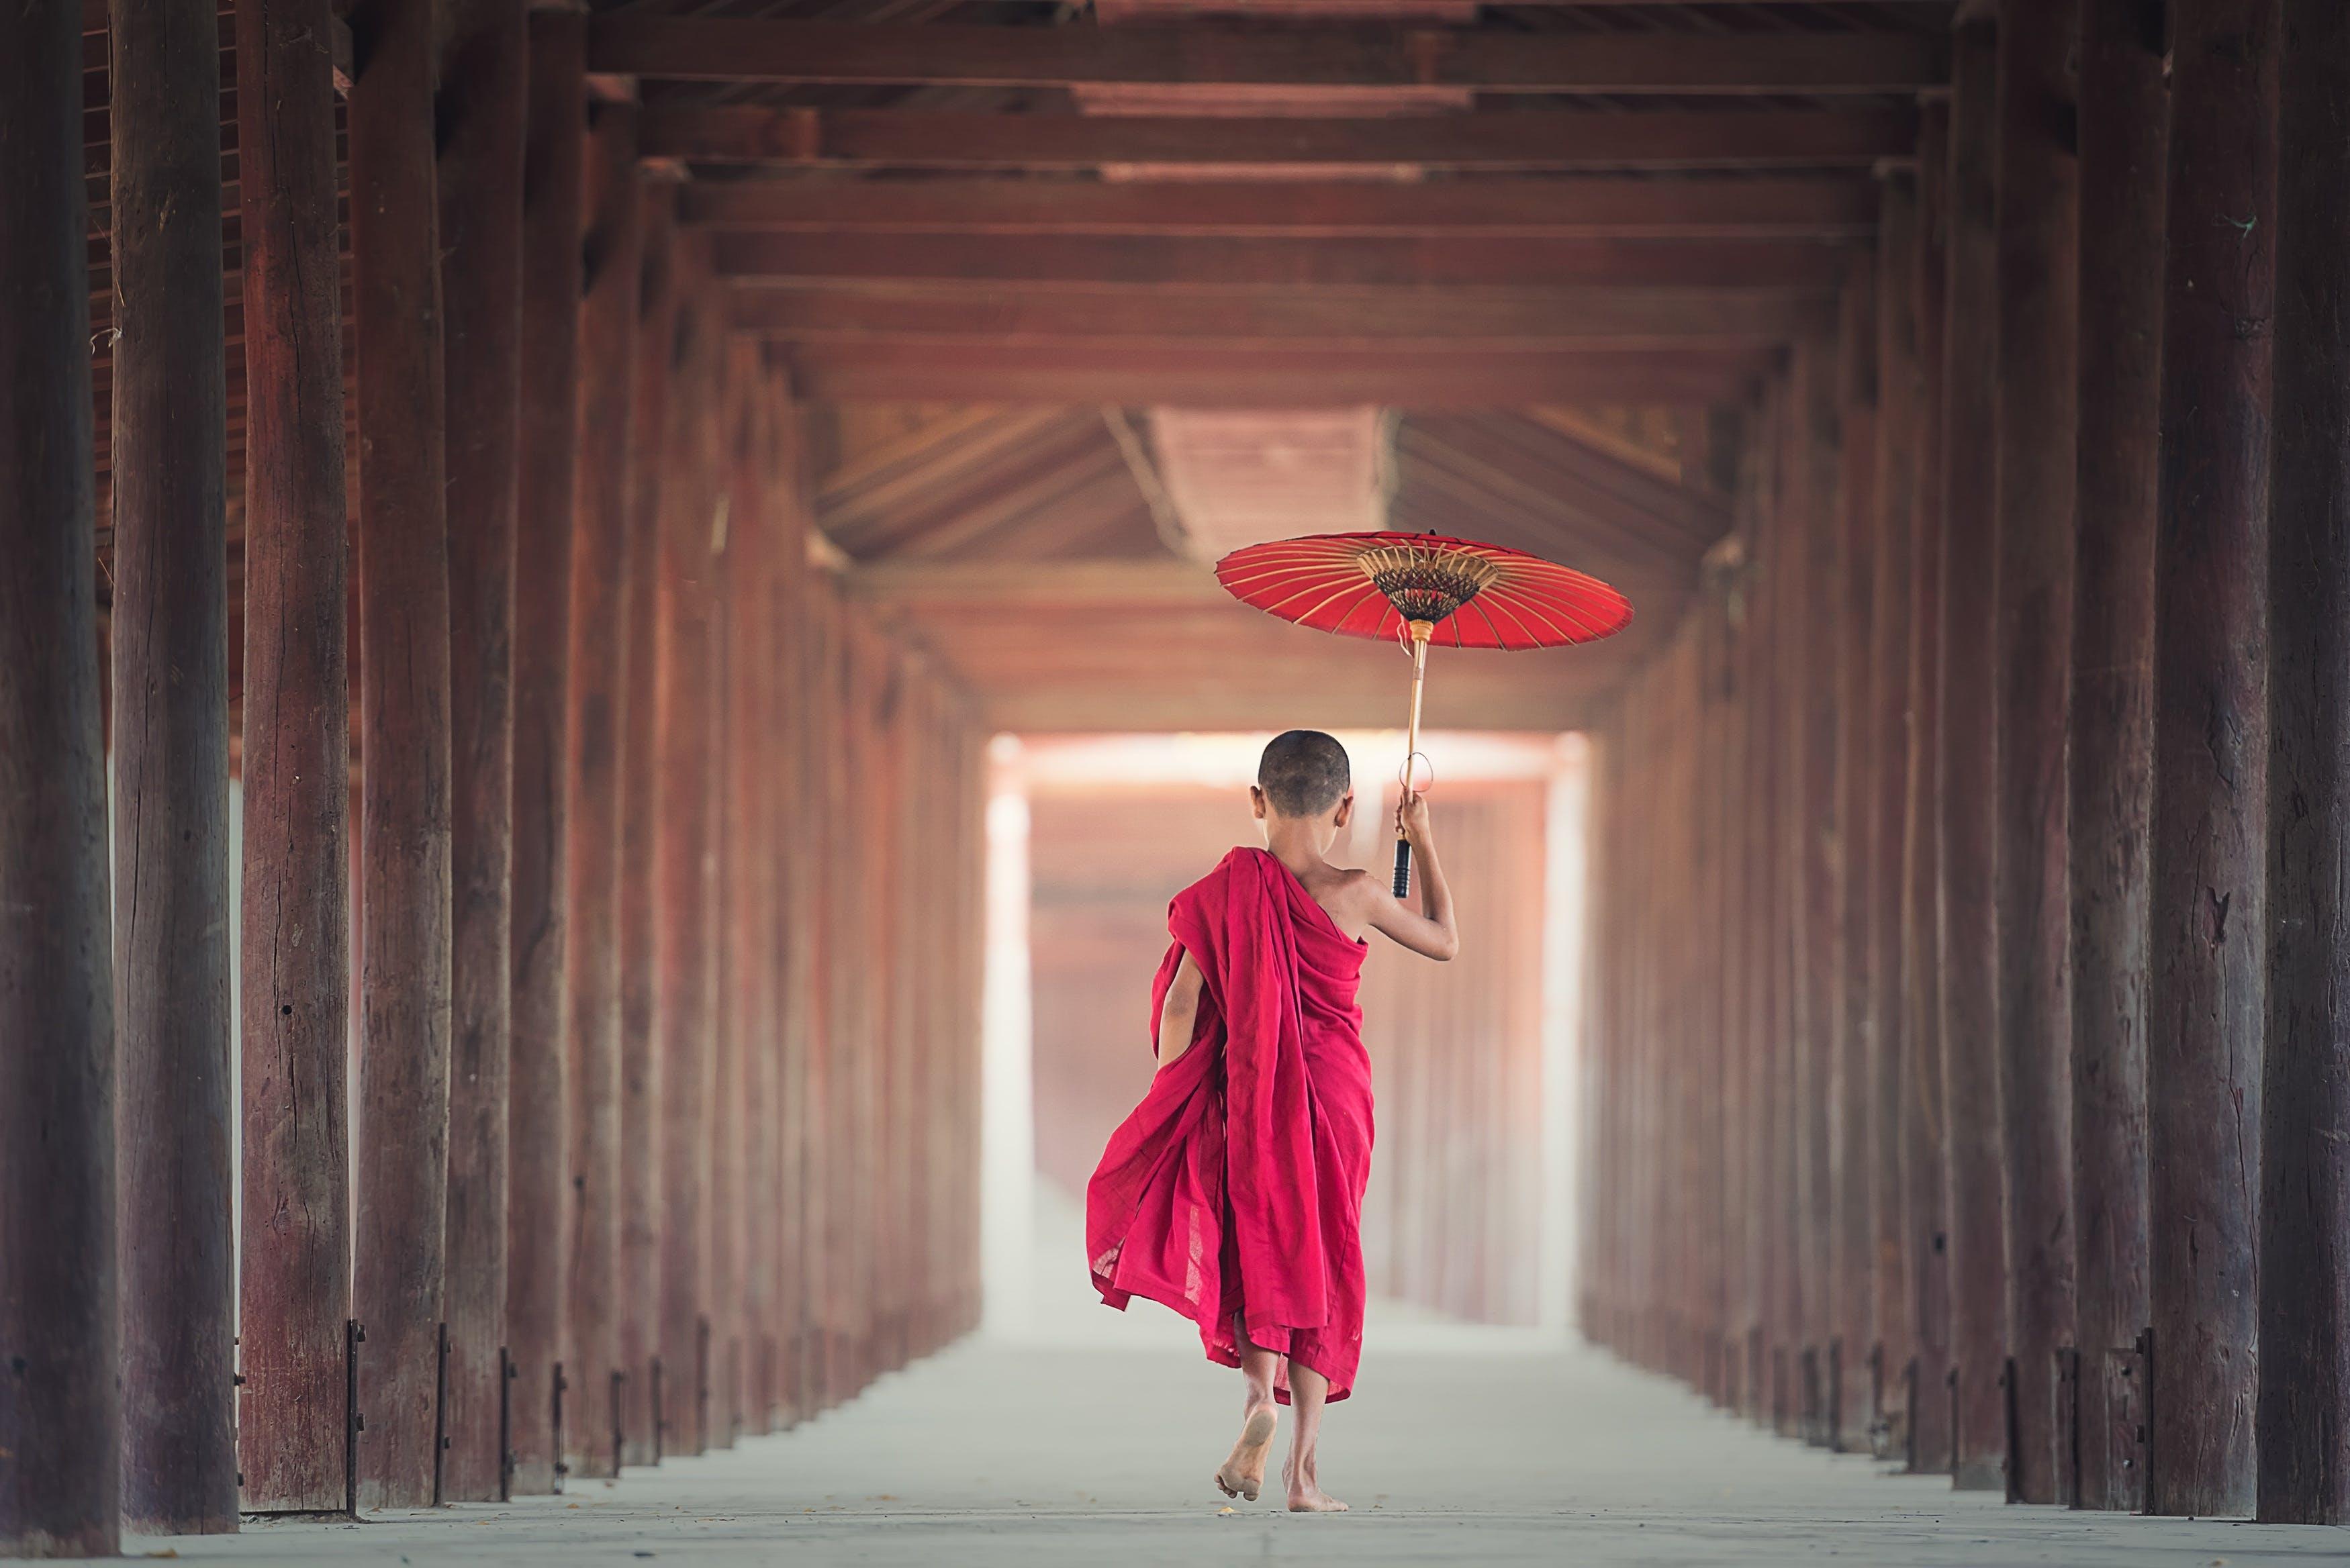 Boy Walking Between Wooden Frame While Holding Umbrella